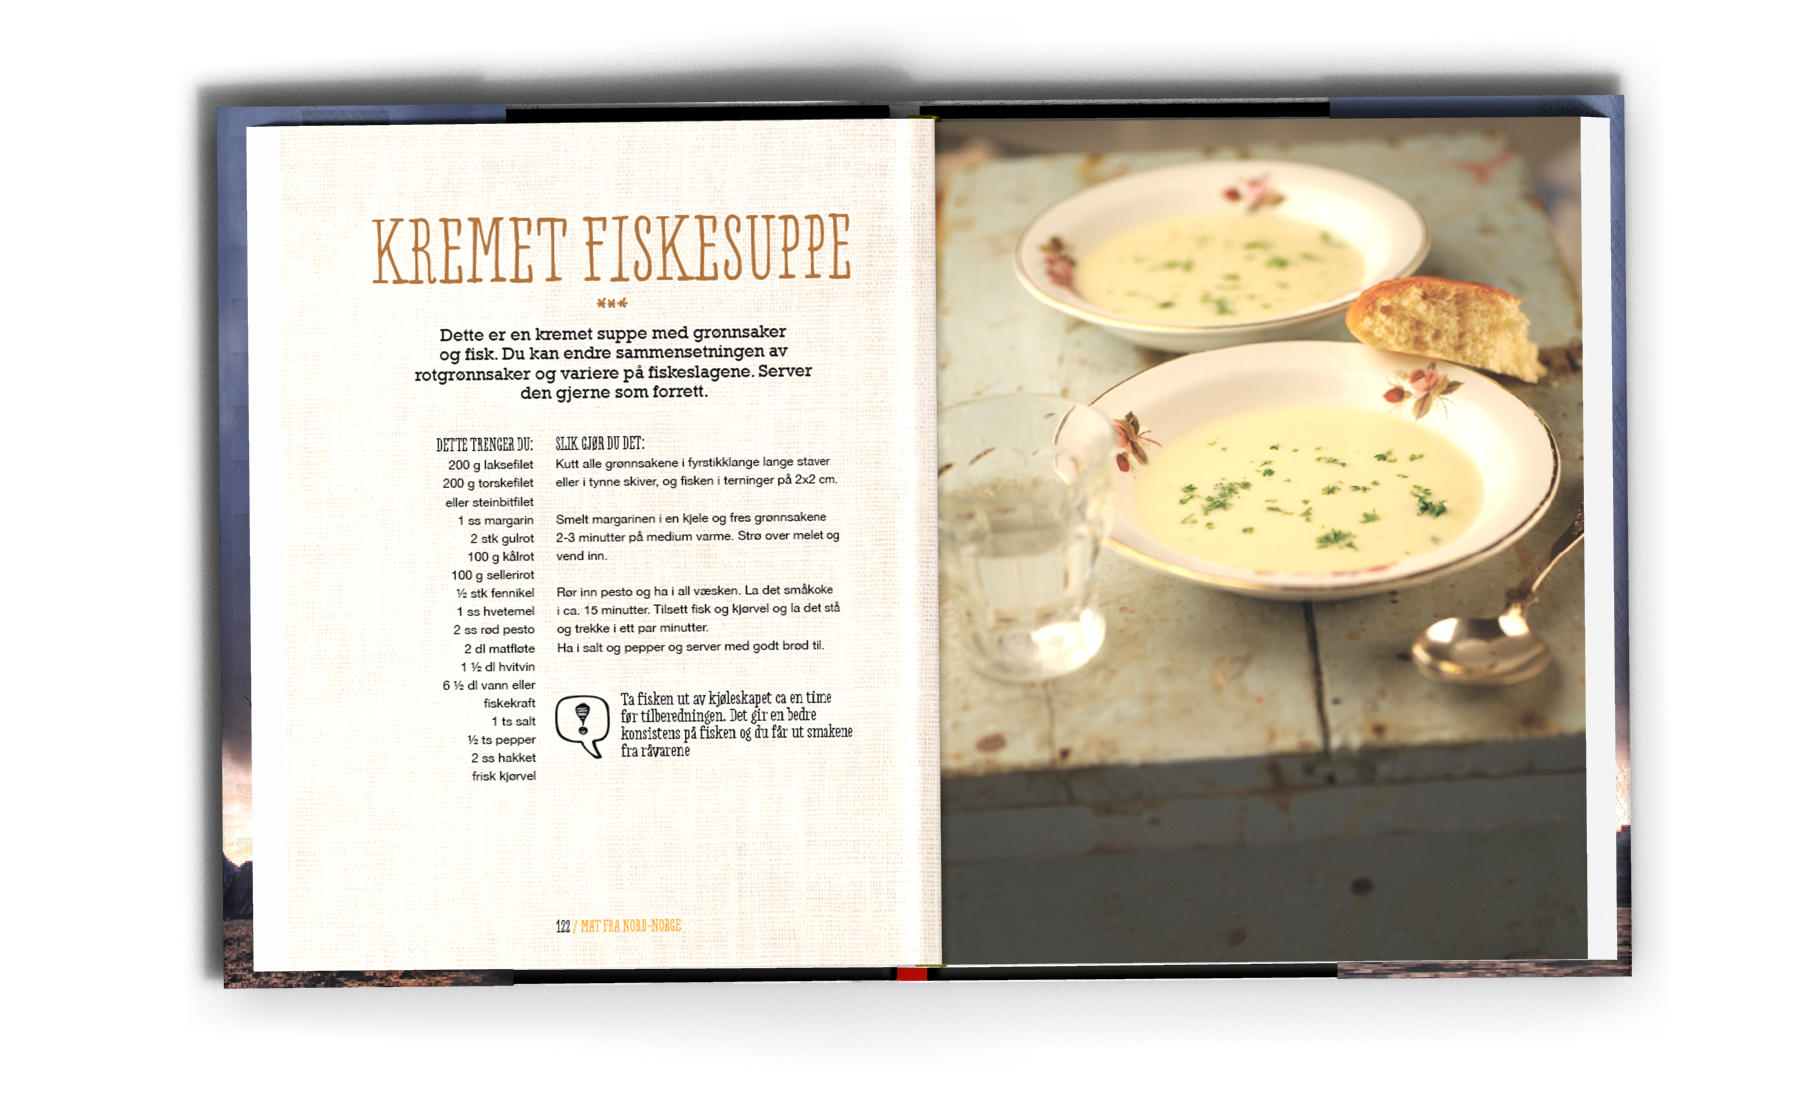 Kokebok fiskesuppe | Kokebok | Pinterest